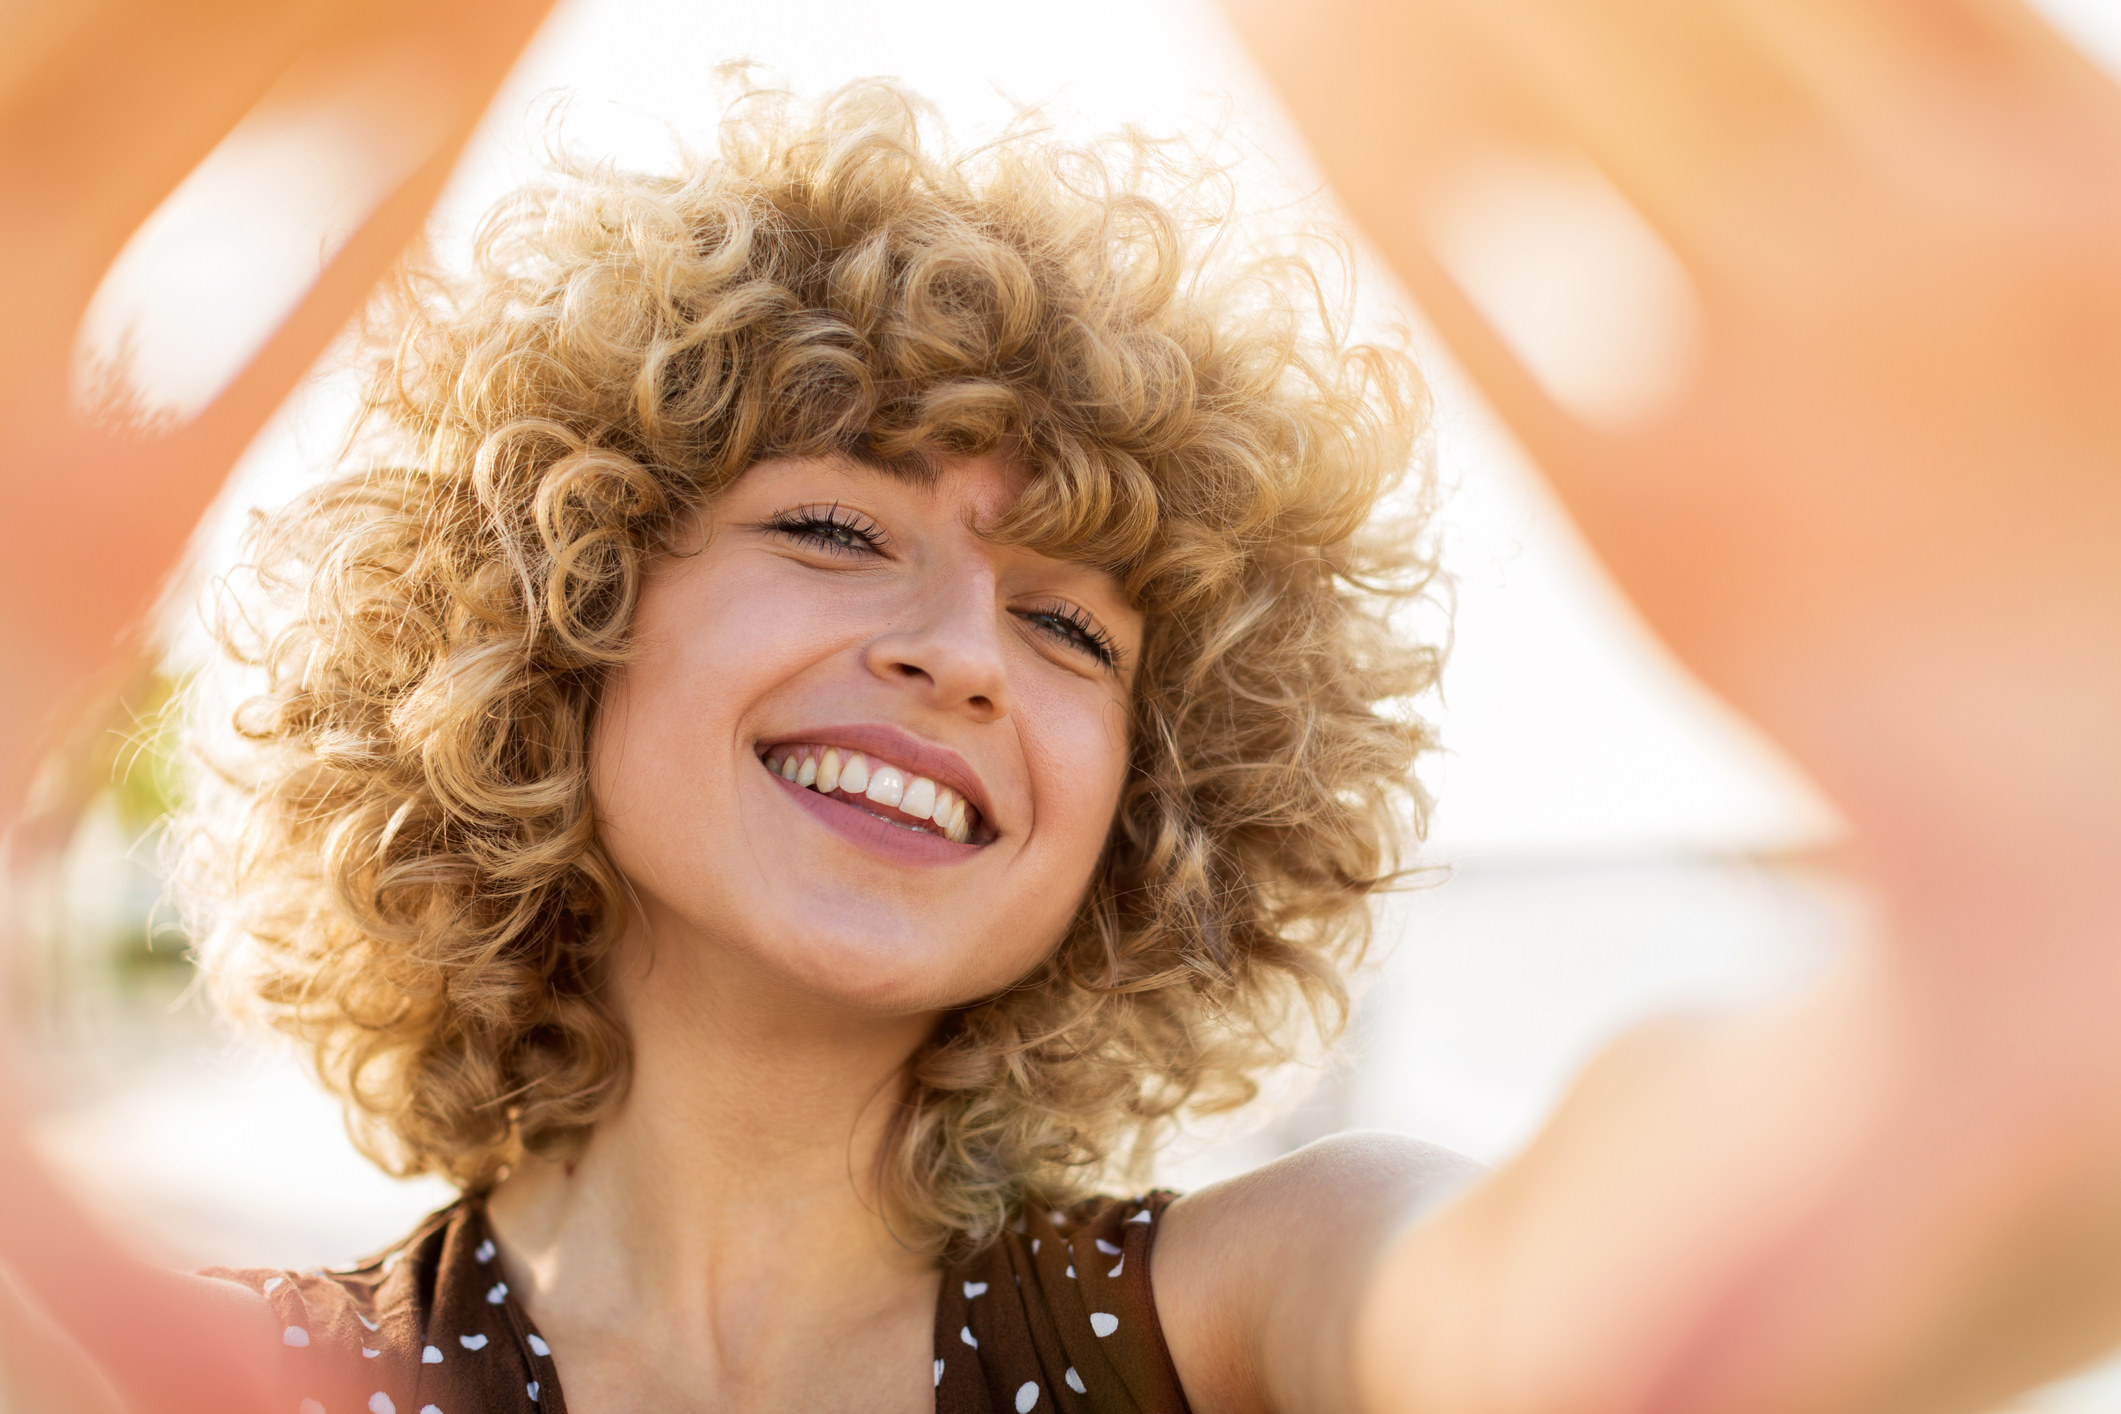 Conograma capilar para cabelos loiros